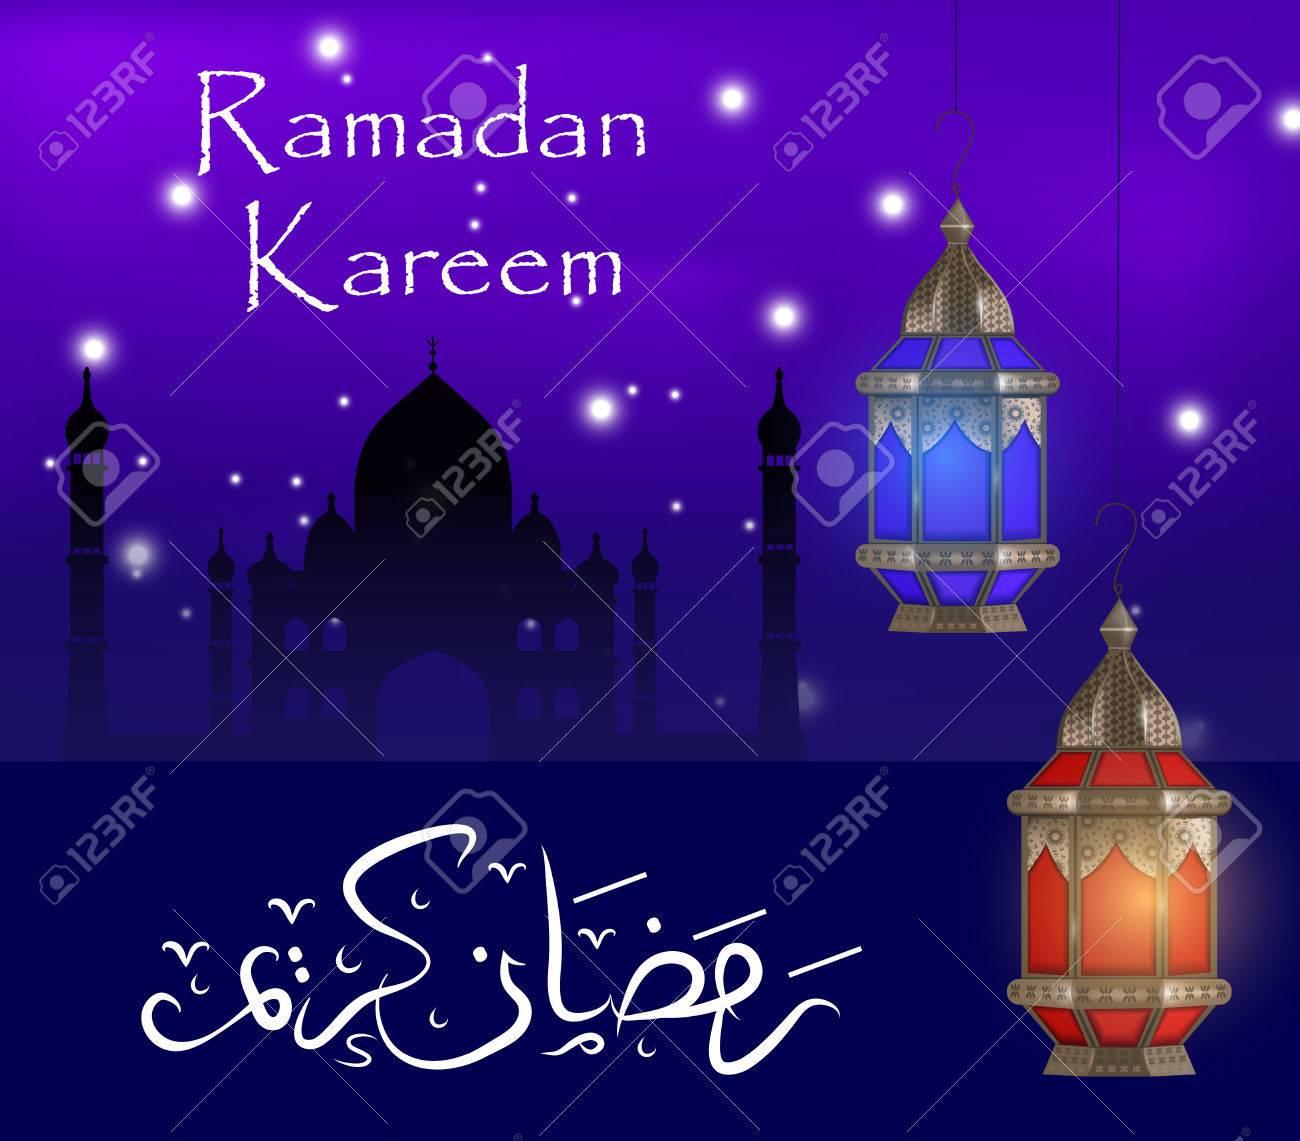 Ramadan kareem greeting card with lanterns template for invitation ramadan kareem greeting card with lanterns template for invitation flyer muslim religious holiday m4hsunfo